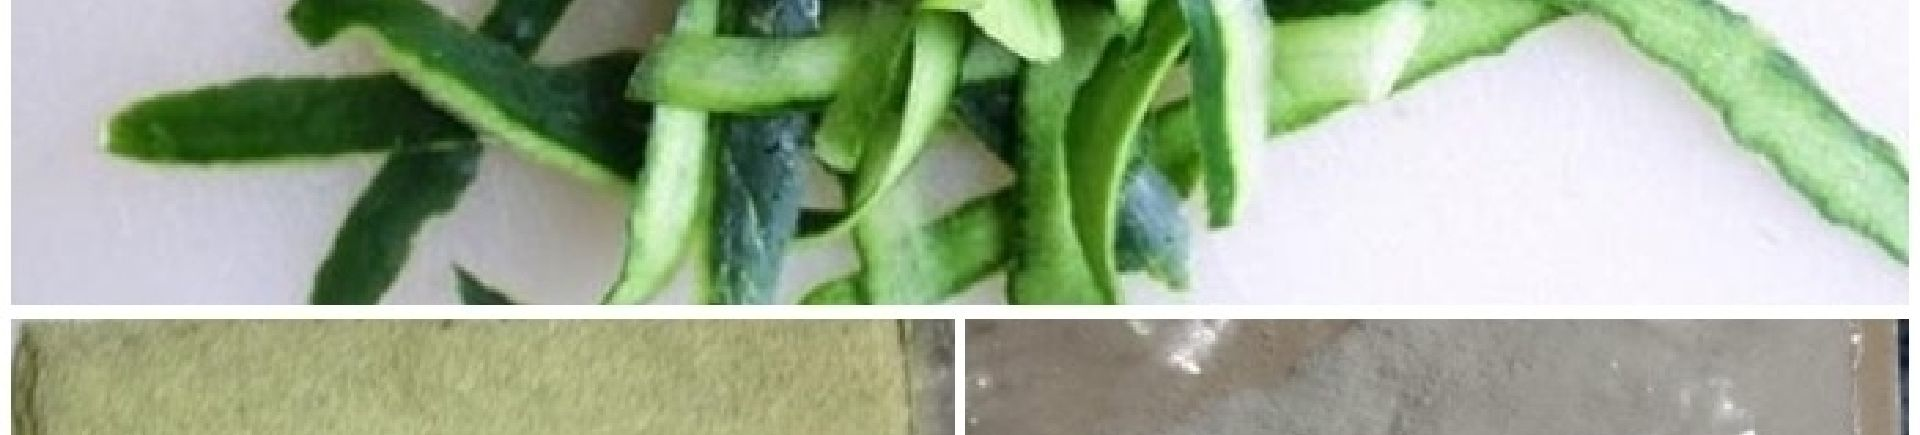 Cucumber peels